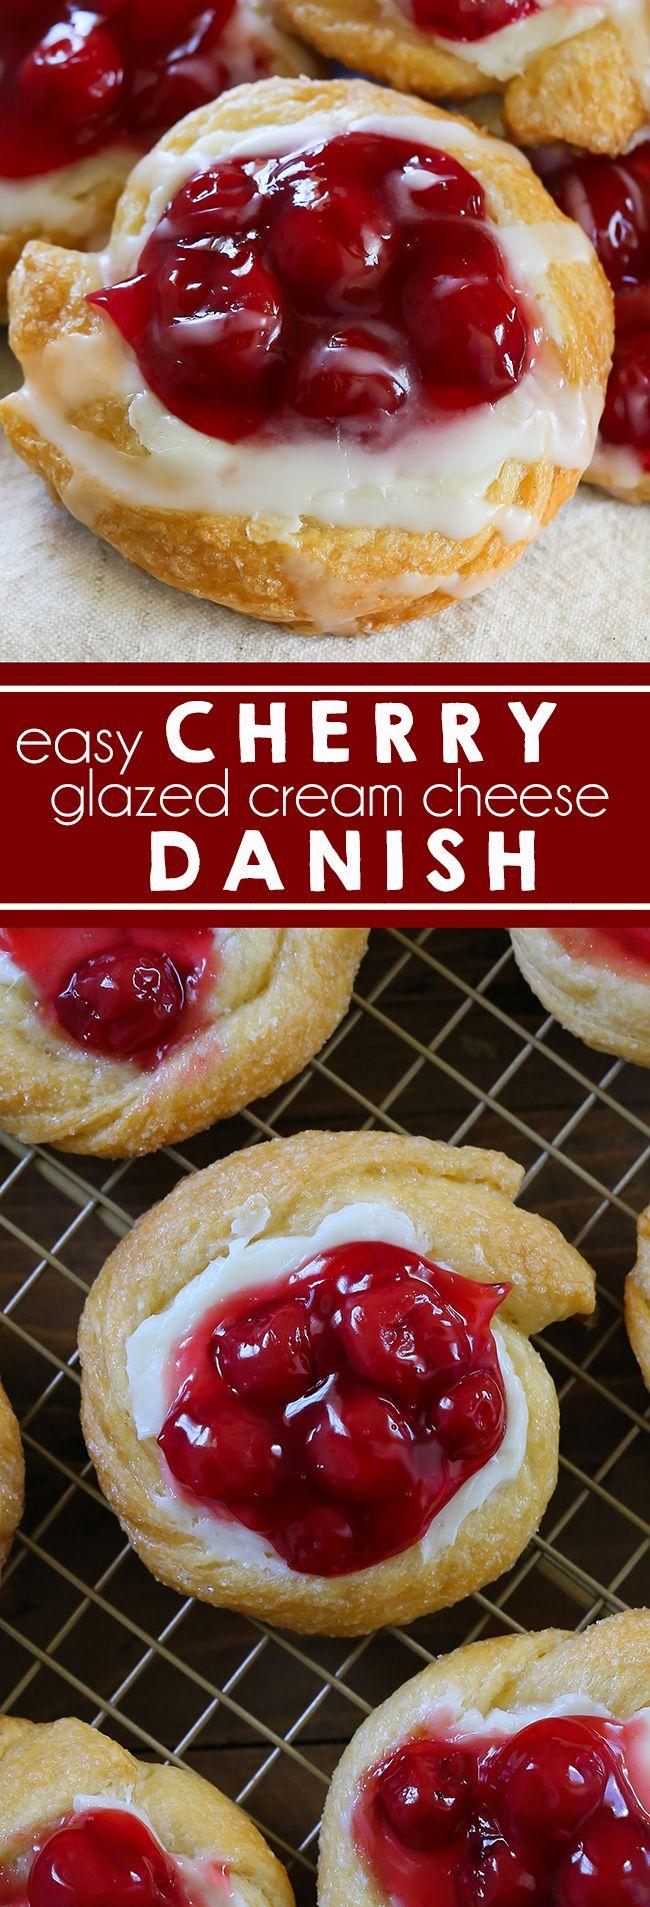 Cherry Danish Cream Cheese Filling I Pastry I Breakfast I Cherry I Cheesecake I Crescent Rolls I Easy Breakfast I Christmas Breakfast I Holiday Food #dessert #breakfast